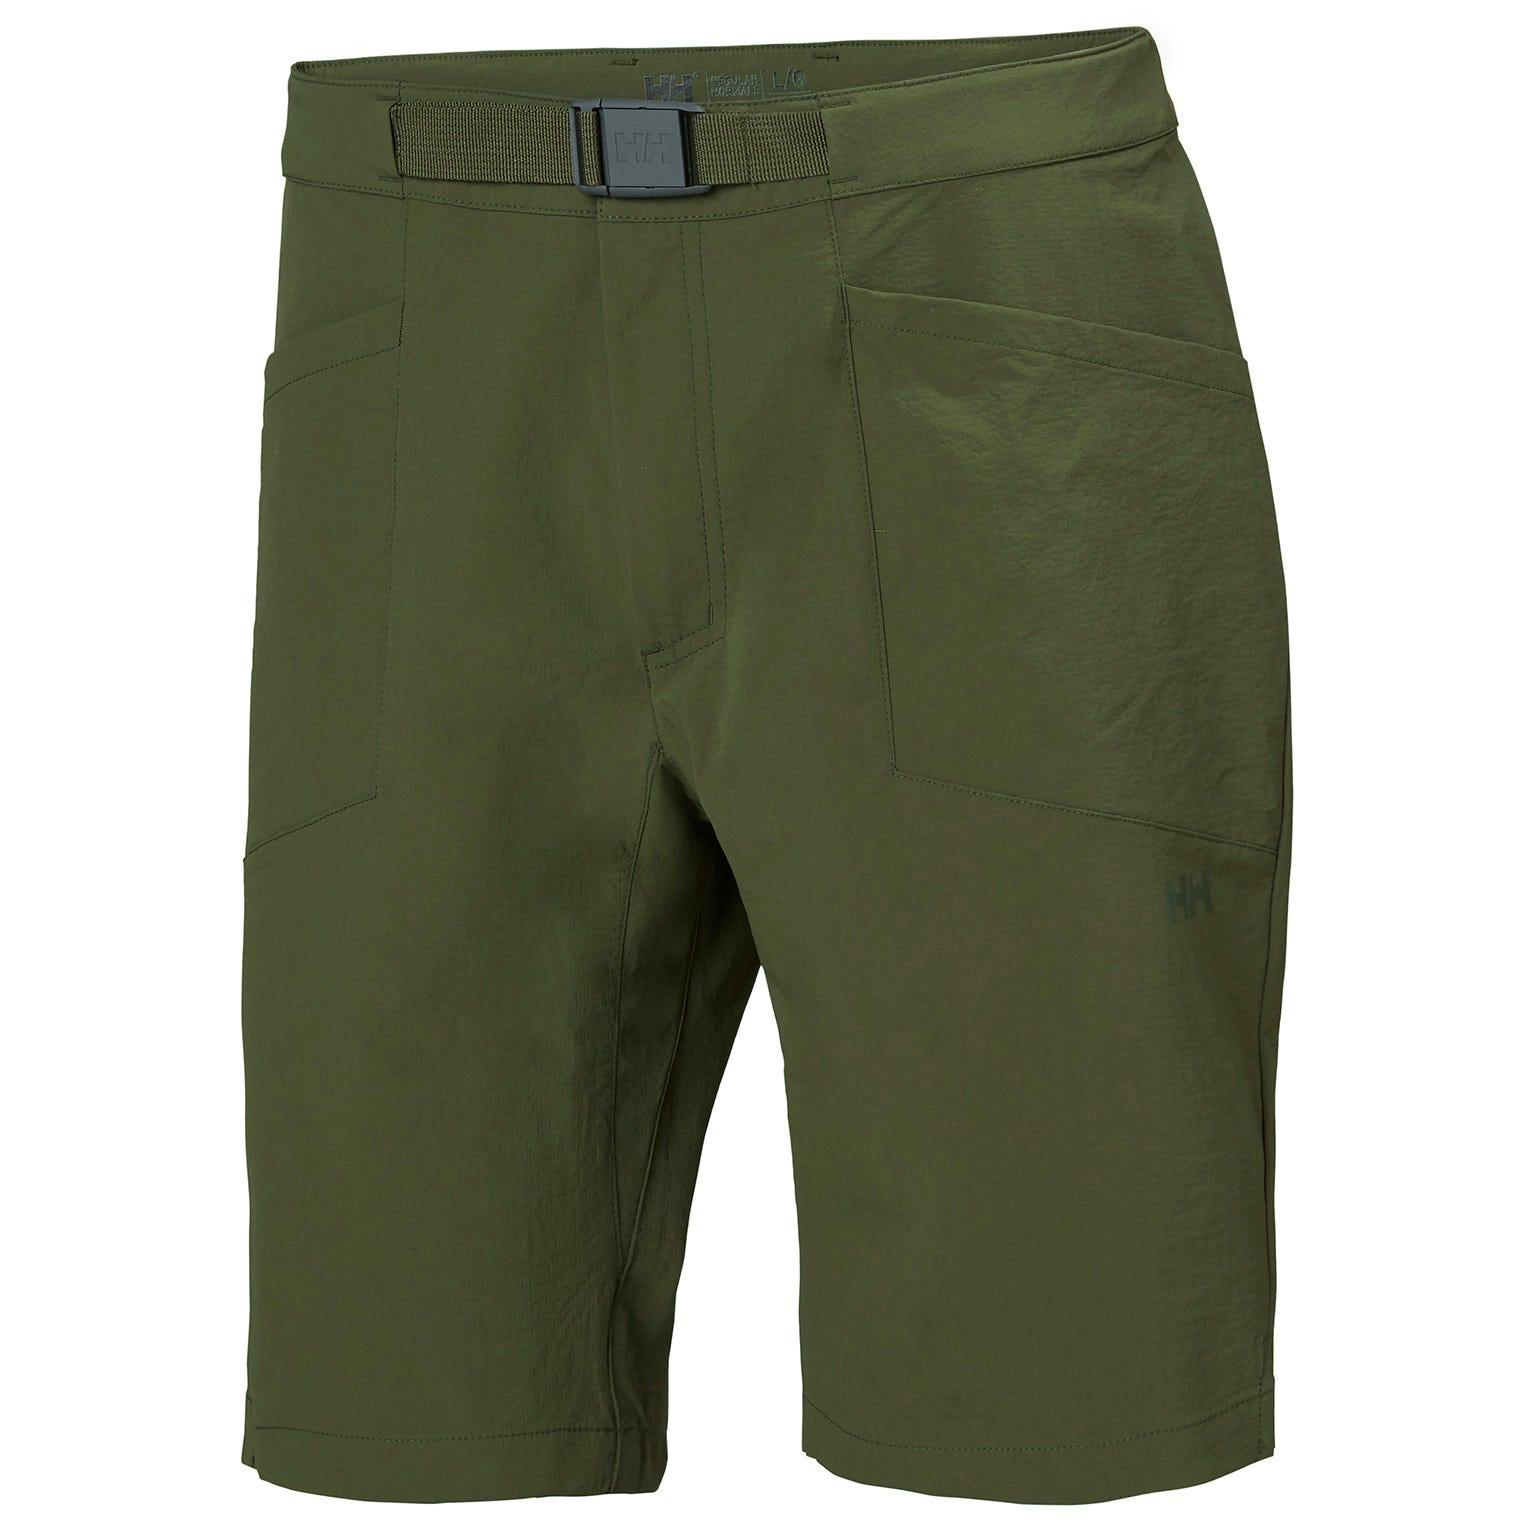 Mens Tinden Lightweight Stretch Shorts | Helly Hansen Mens Hiking Trouser Green XL